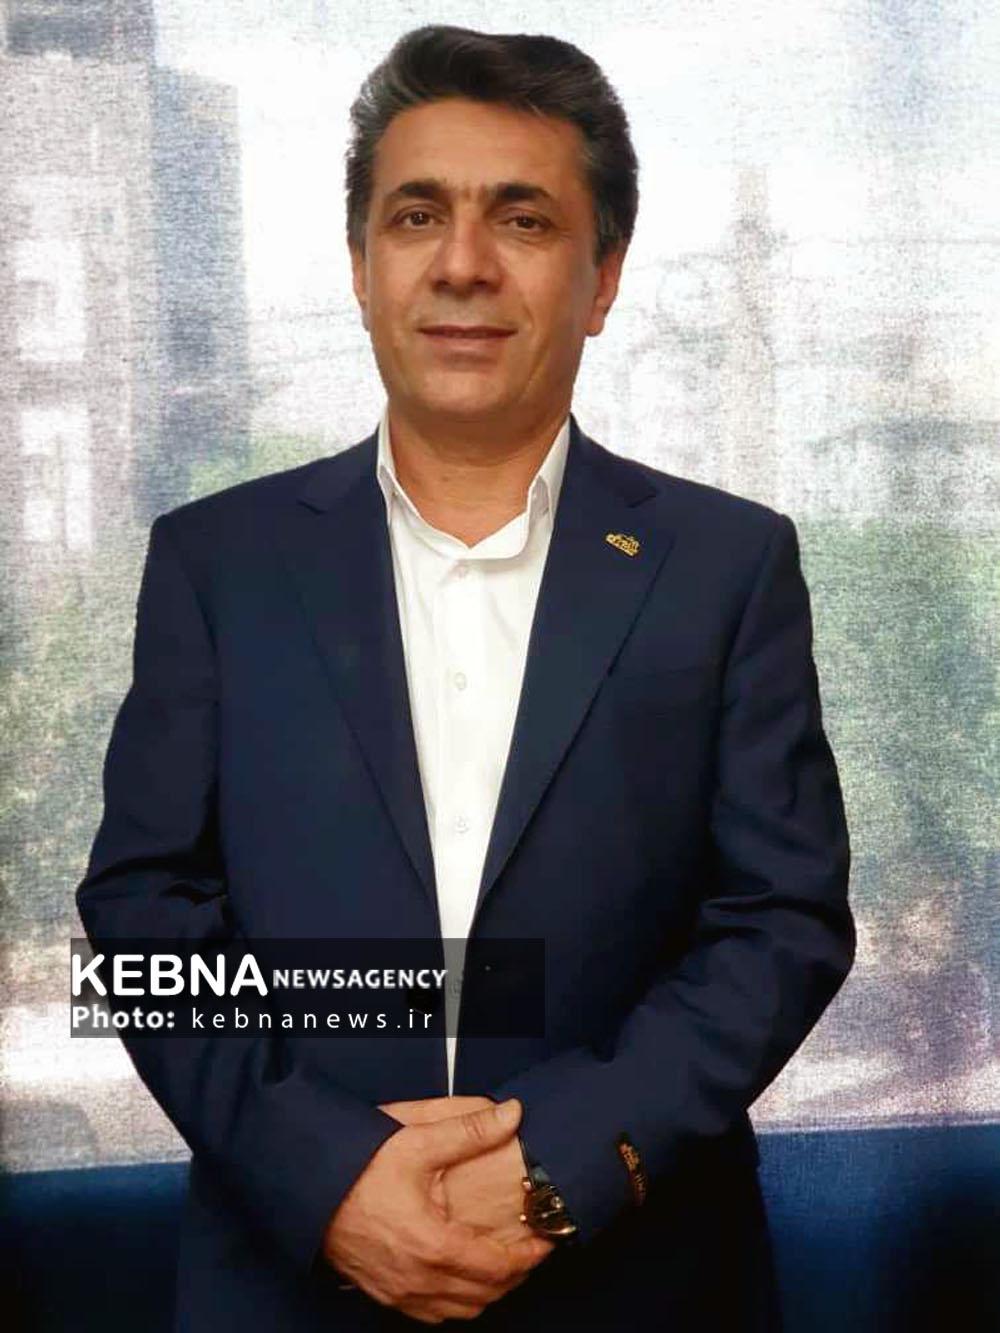 https://www.kebnanews.ir/images/docs/files/000410/nf00410482-1.jpg